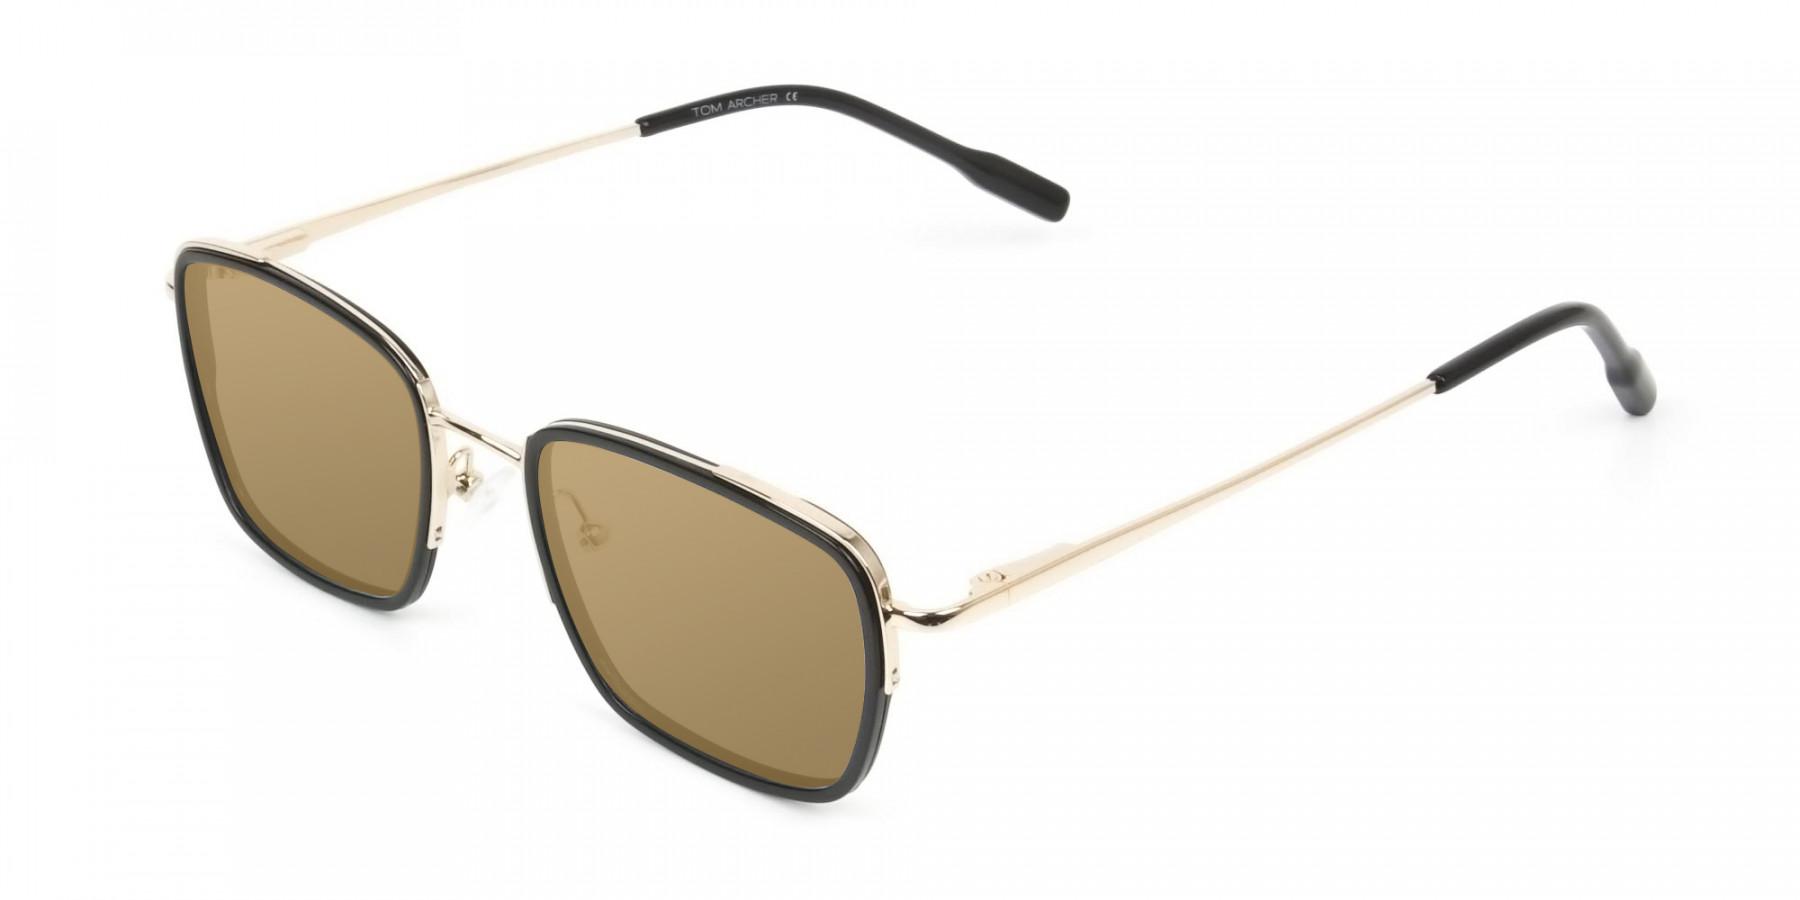 Dark Brown Tinted Black & Gold Square Wayfarer Sunglasses - 3